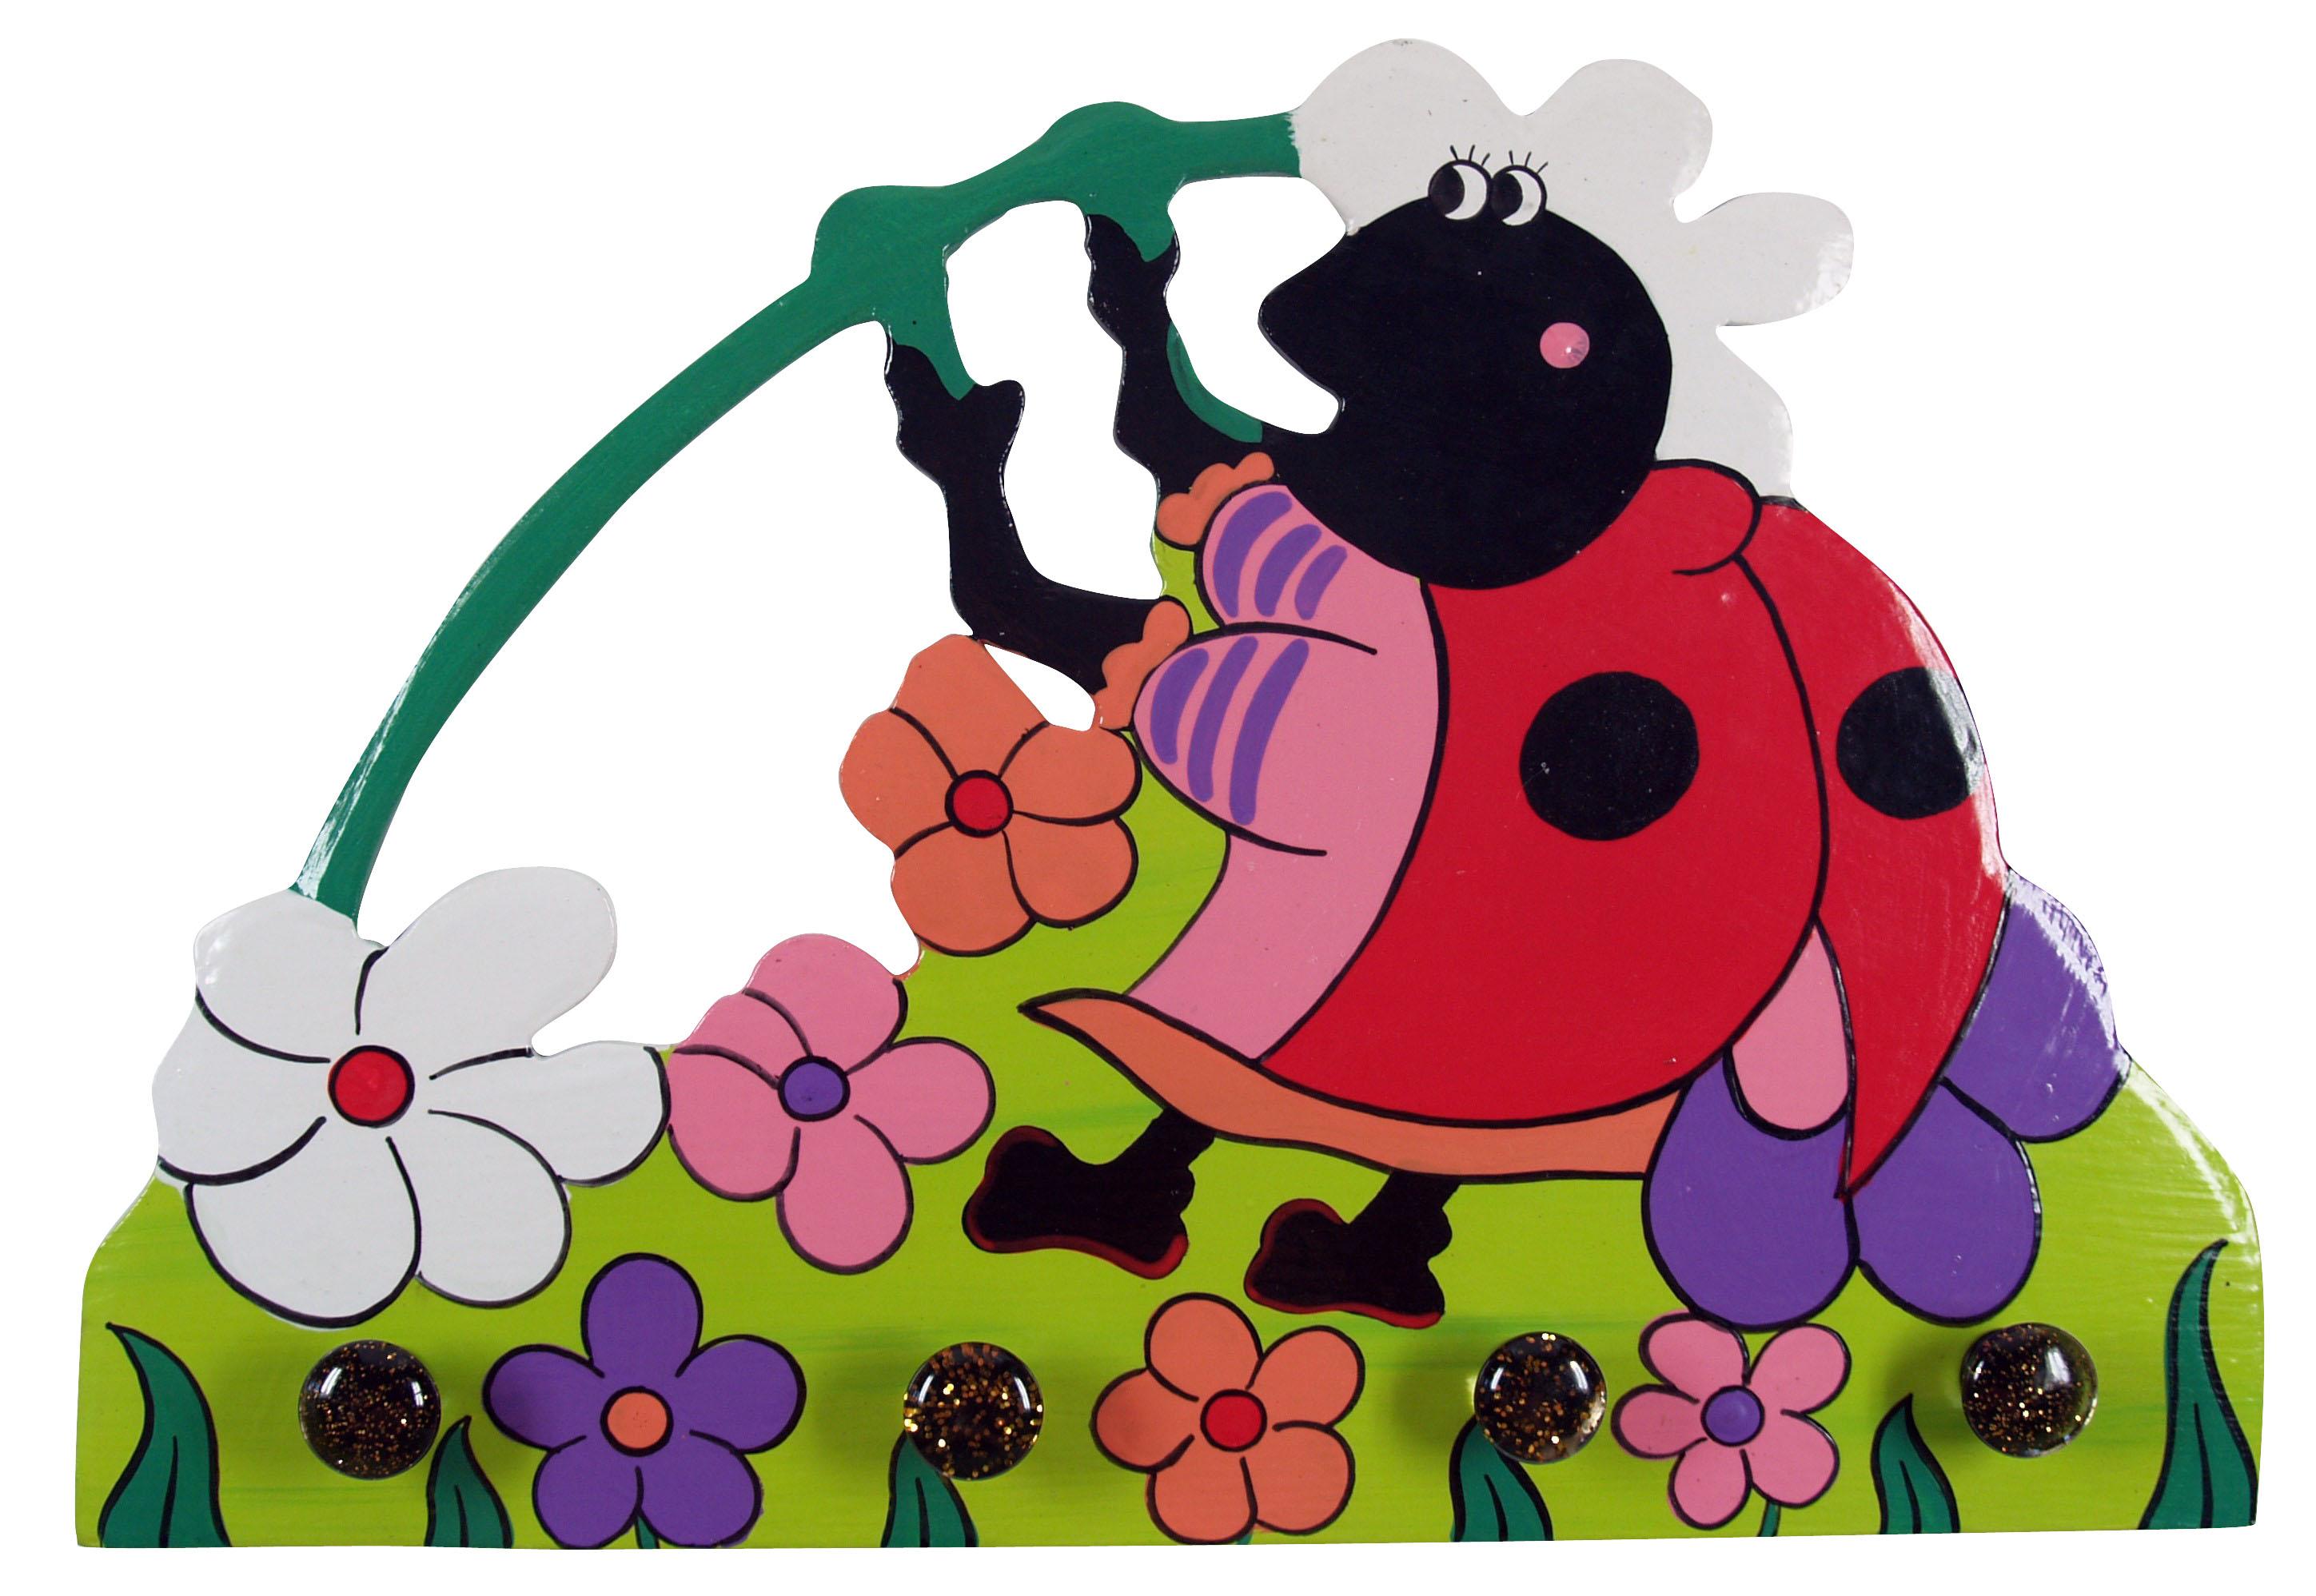 bunte kindergarderobe wandhaken `käfer` /, Hause ideen